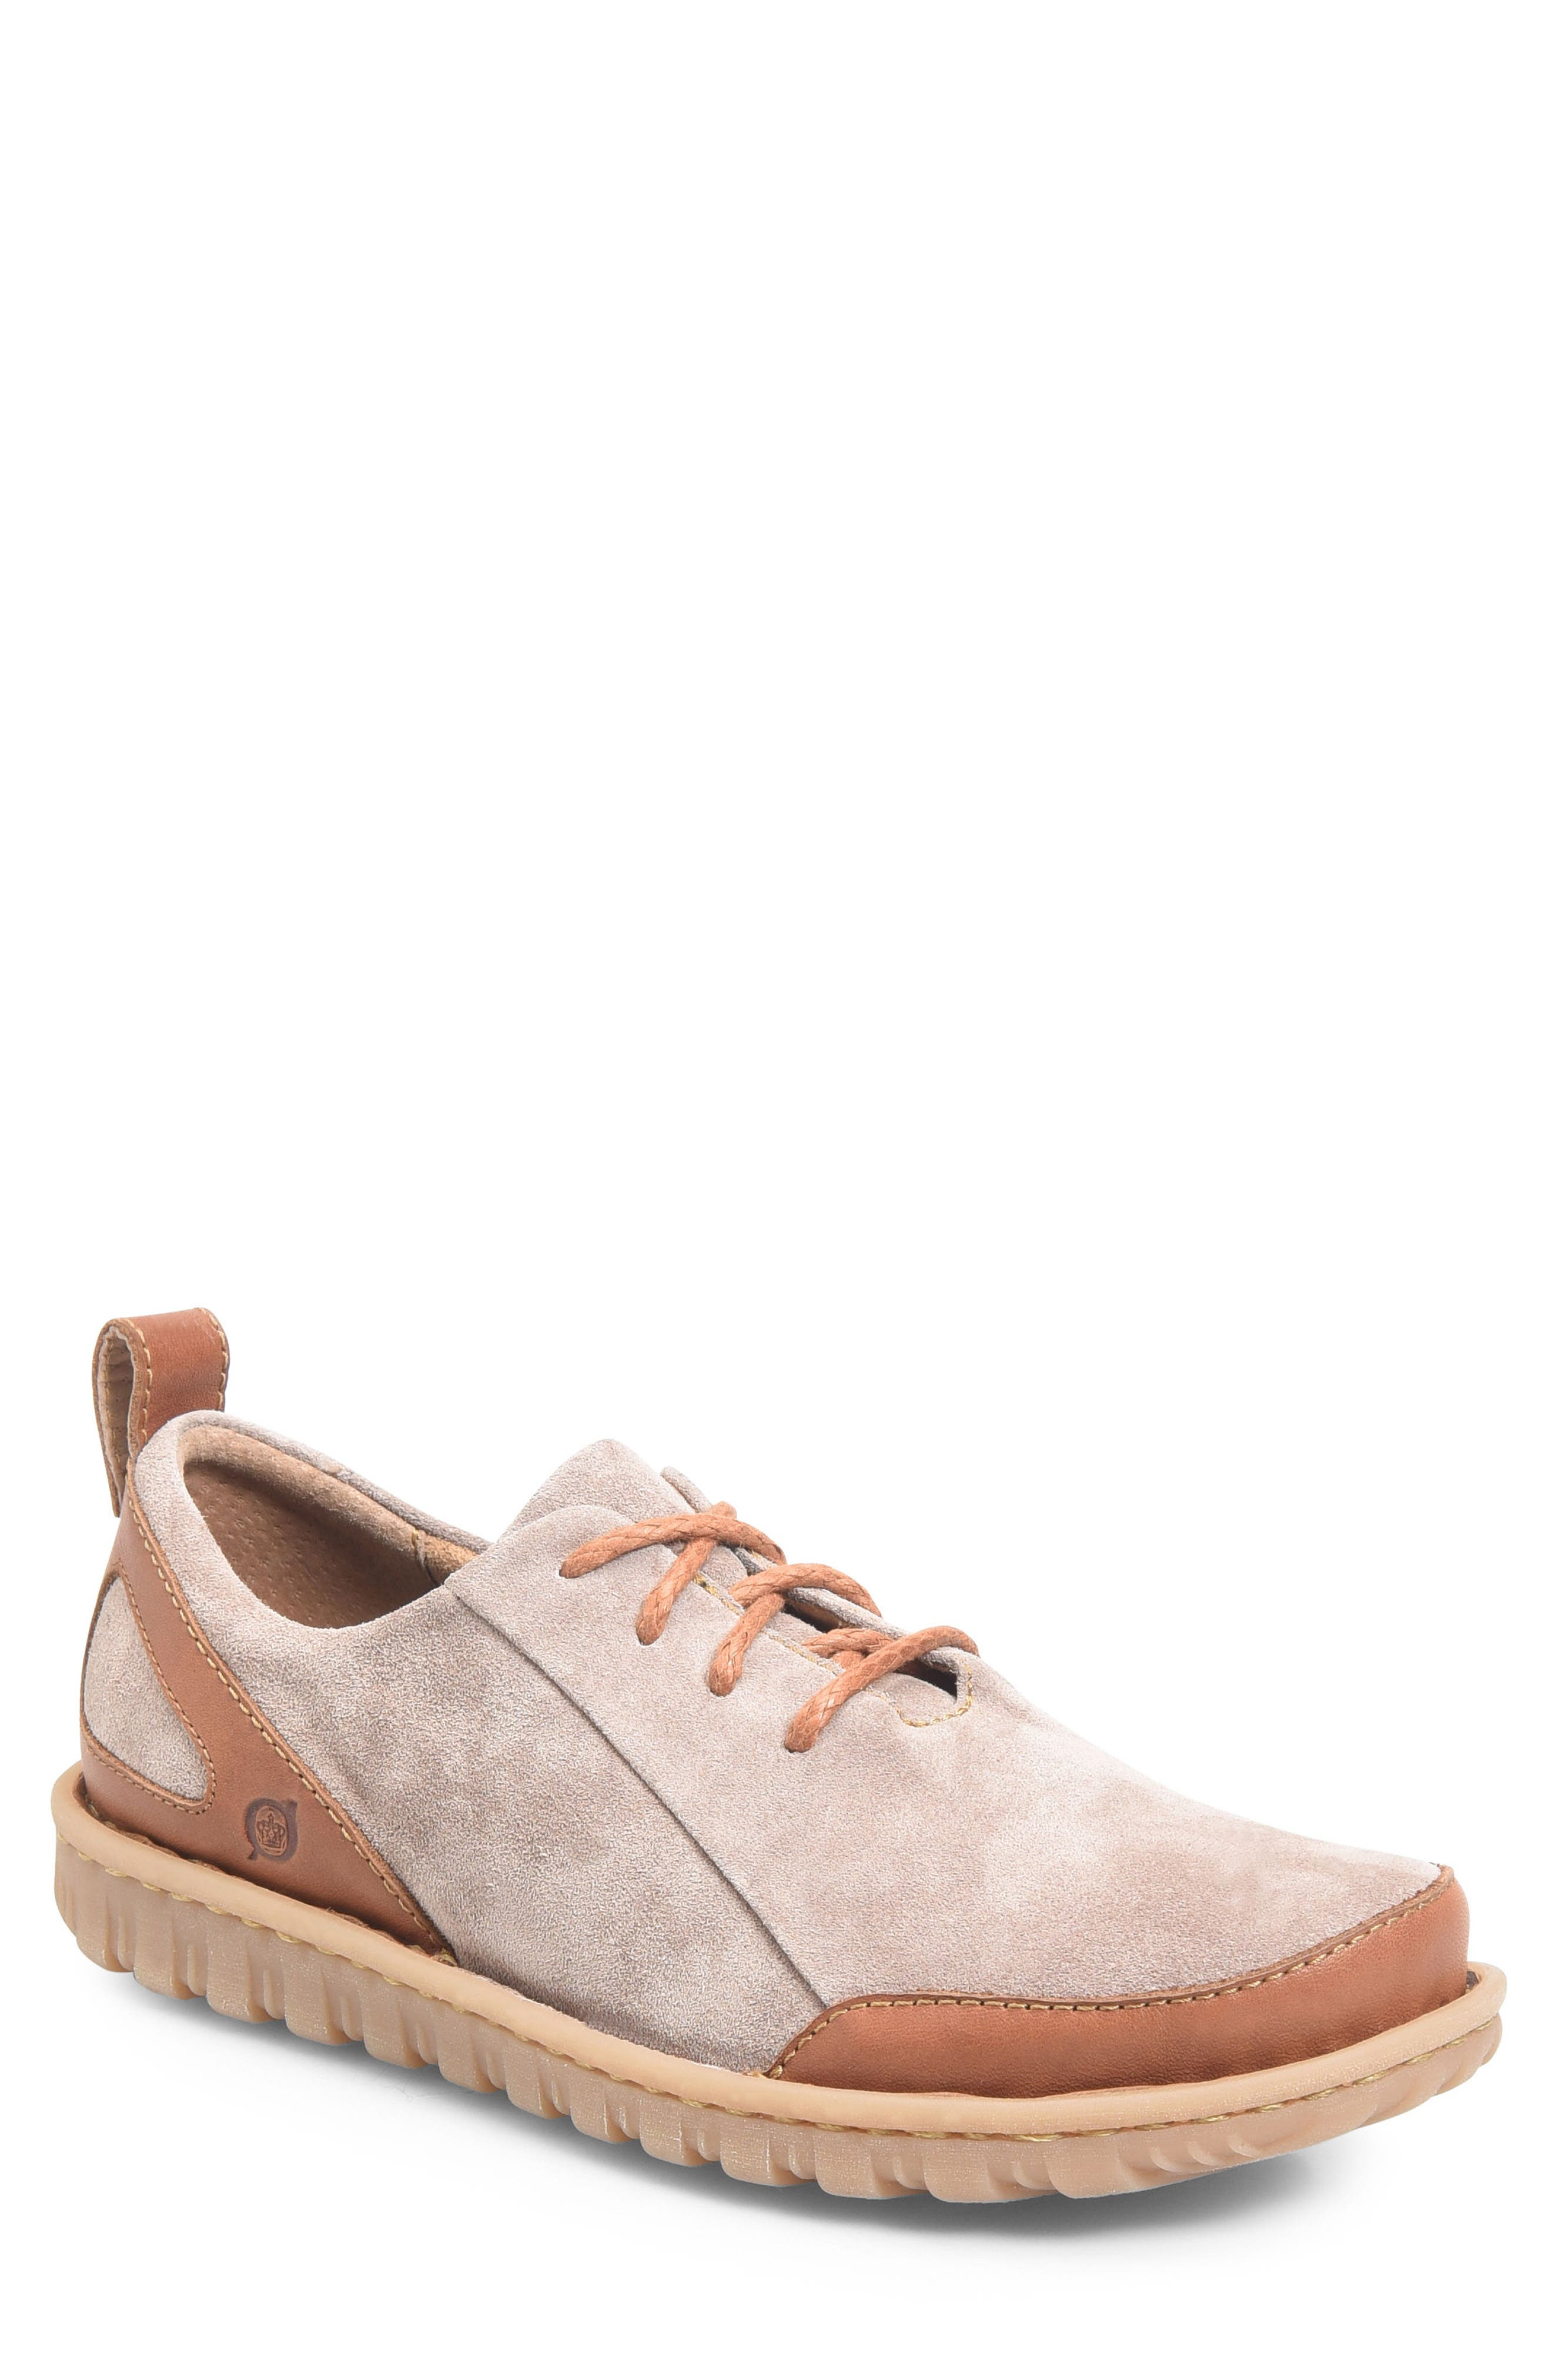 Piper Plain Toe Derby,                         Main,                         color, Grey/ Bronze Leather